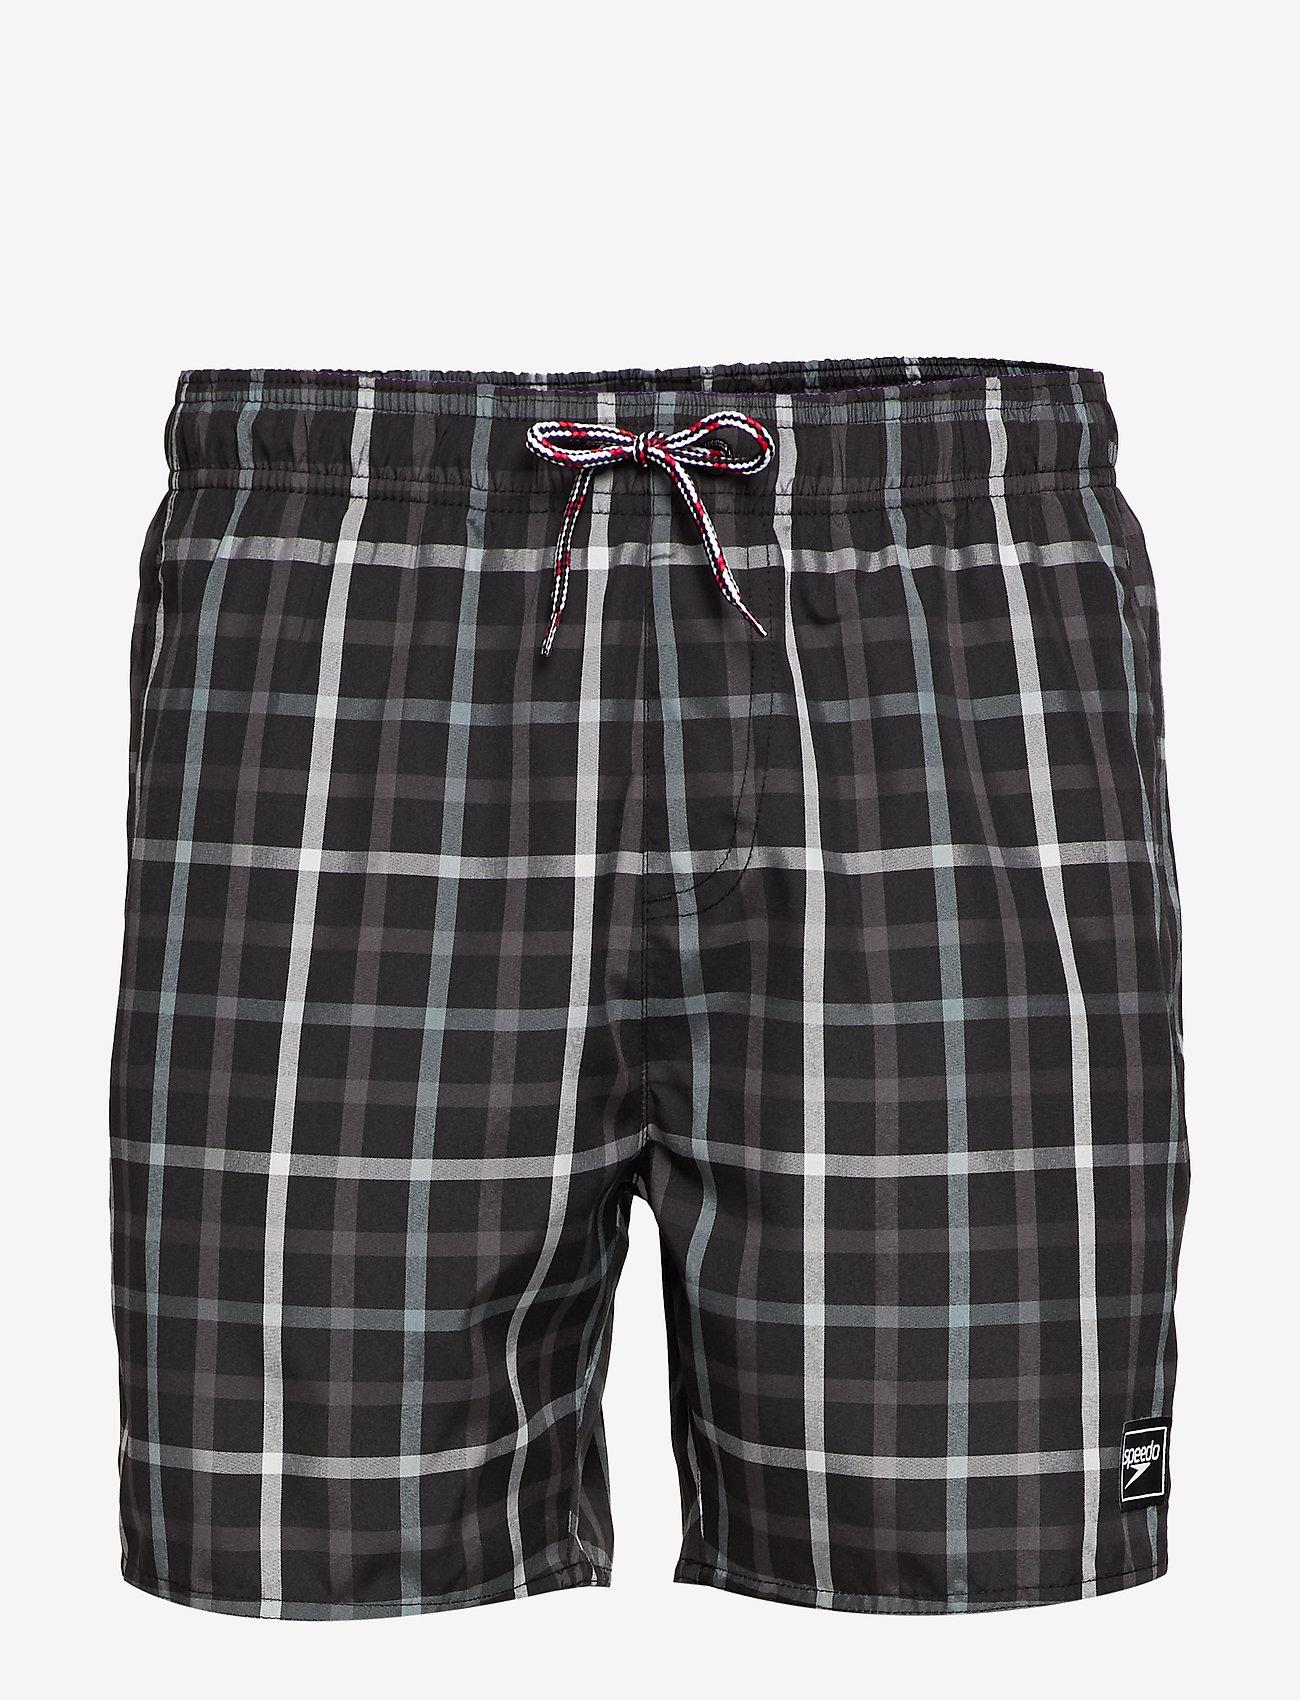 "Speedo - Check Leisure 16"" Watershort - shorts - black/oxid grey/usa charcoal - 0"